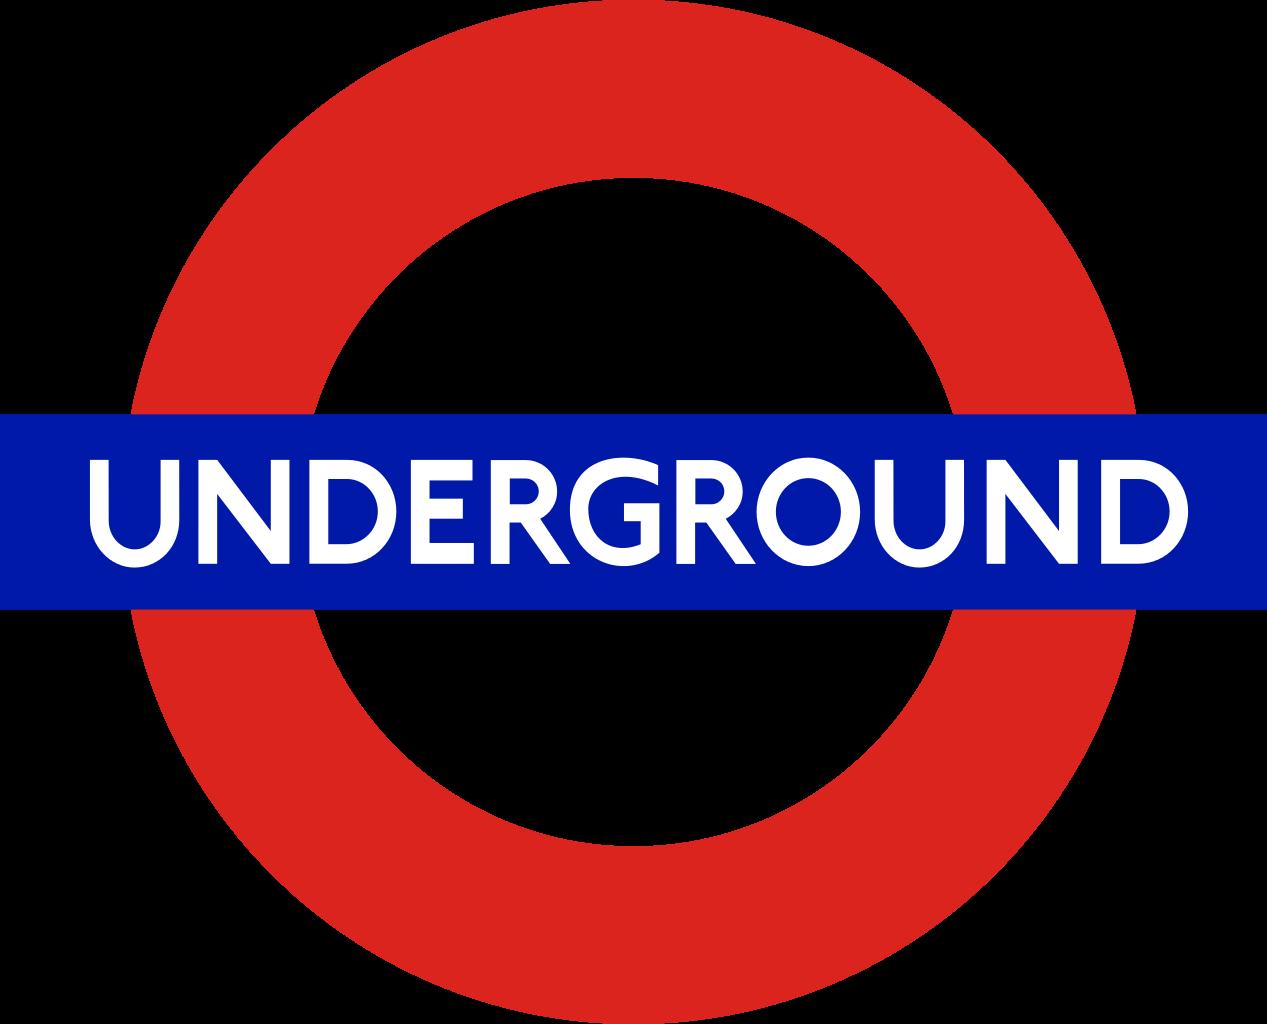 Tube svg #4, Download drawings